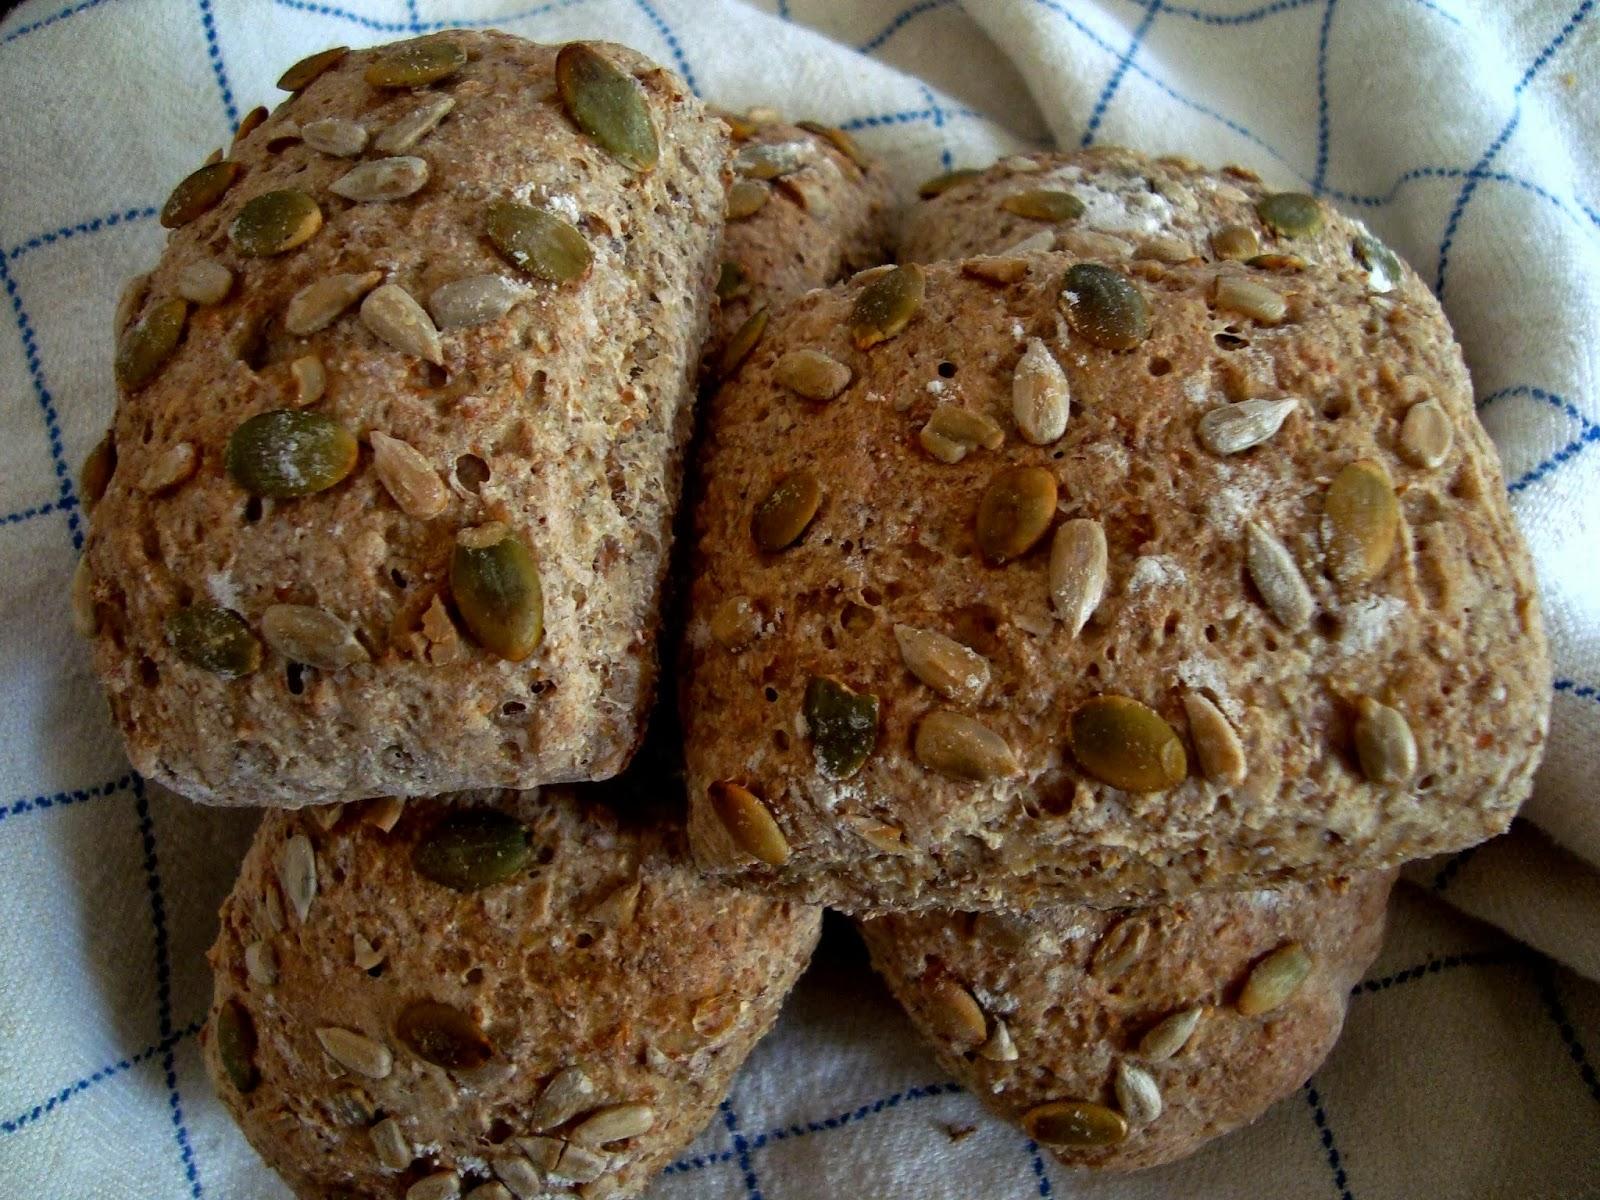 grovt bröd med gräddfil